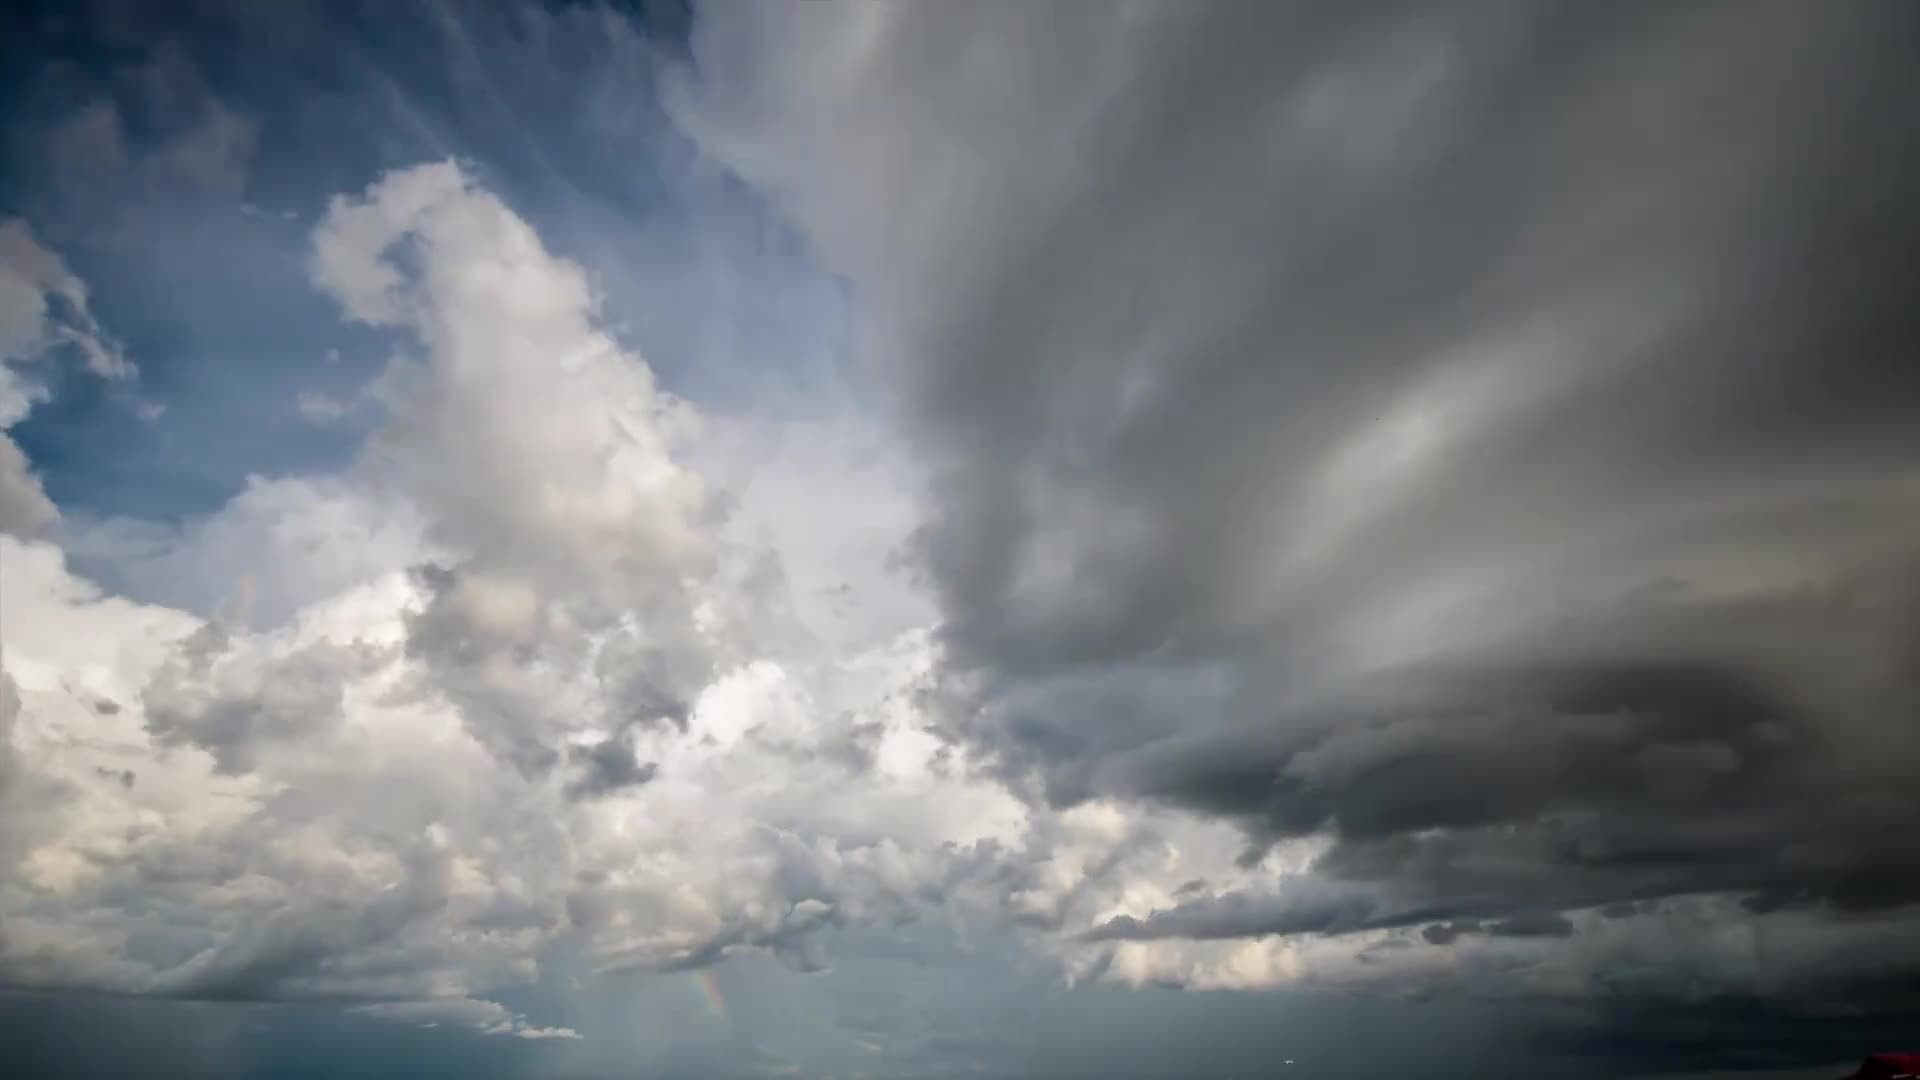 weathergifs, AWAKEN 4K GIFs